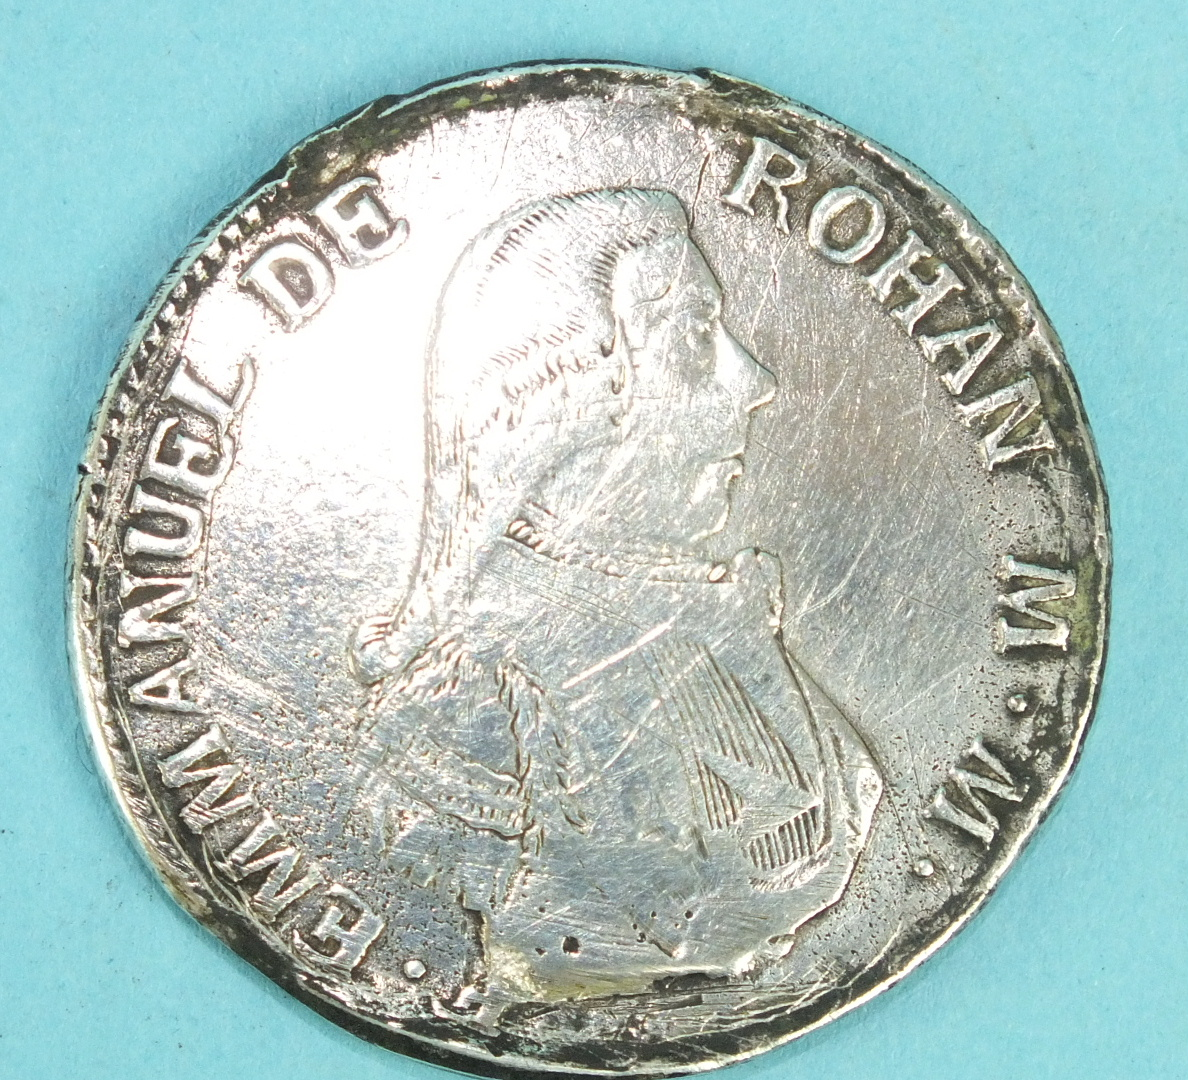 Lot 54 - A 1796 Emmanuel De Rohan 2-Scudi Malta silver coin.